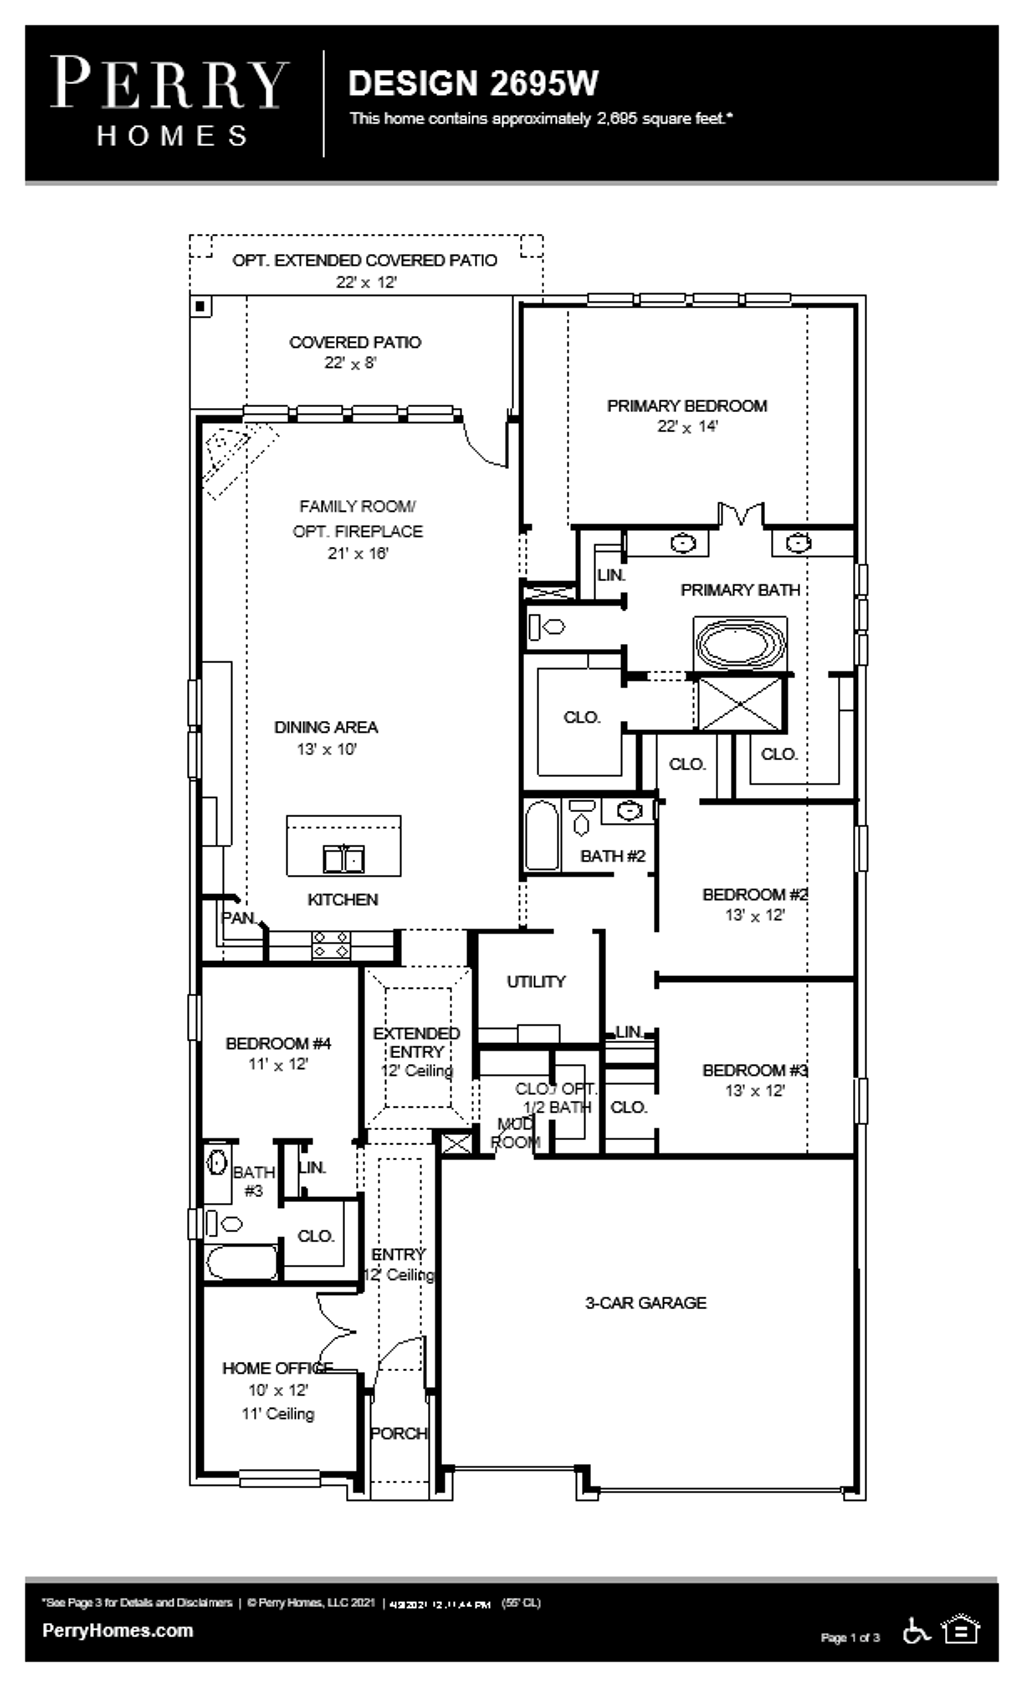 Floor Plan for 2695W